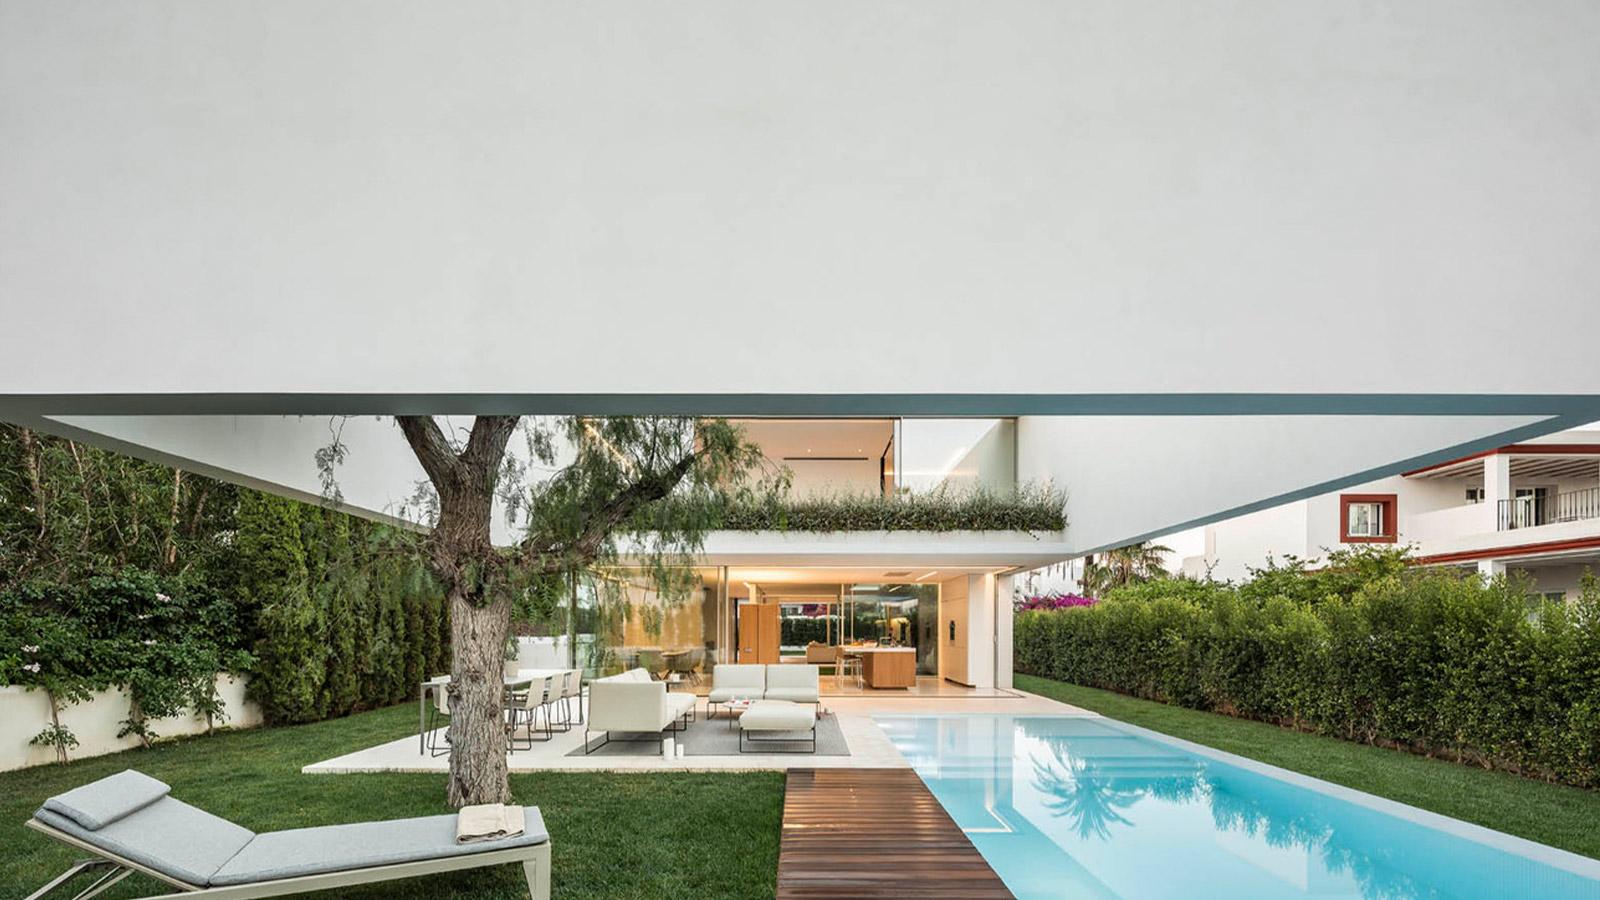 The House of Three Trees by Gallardo Llopis Arquitectos